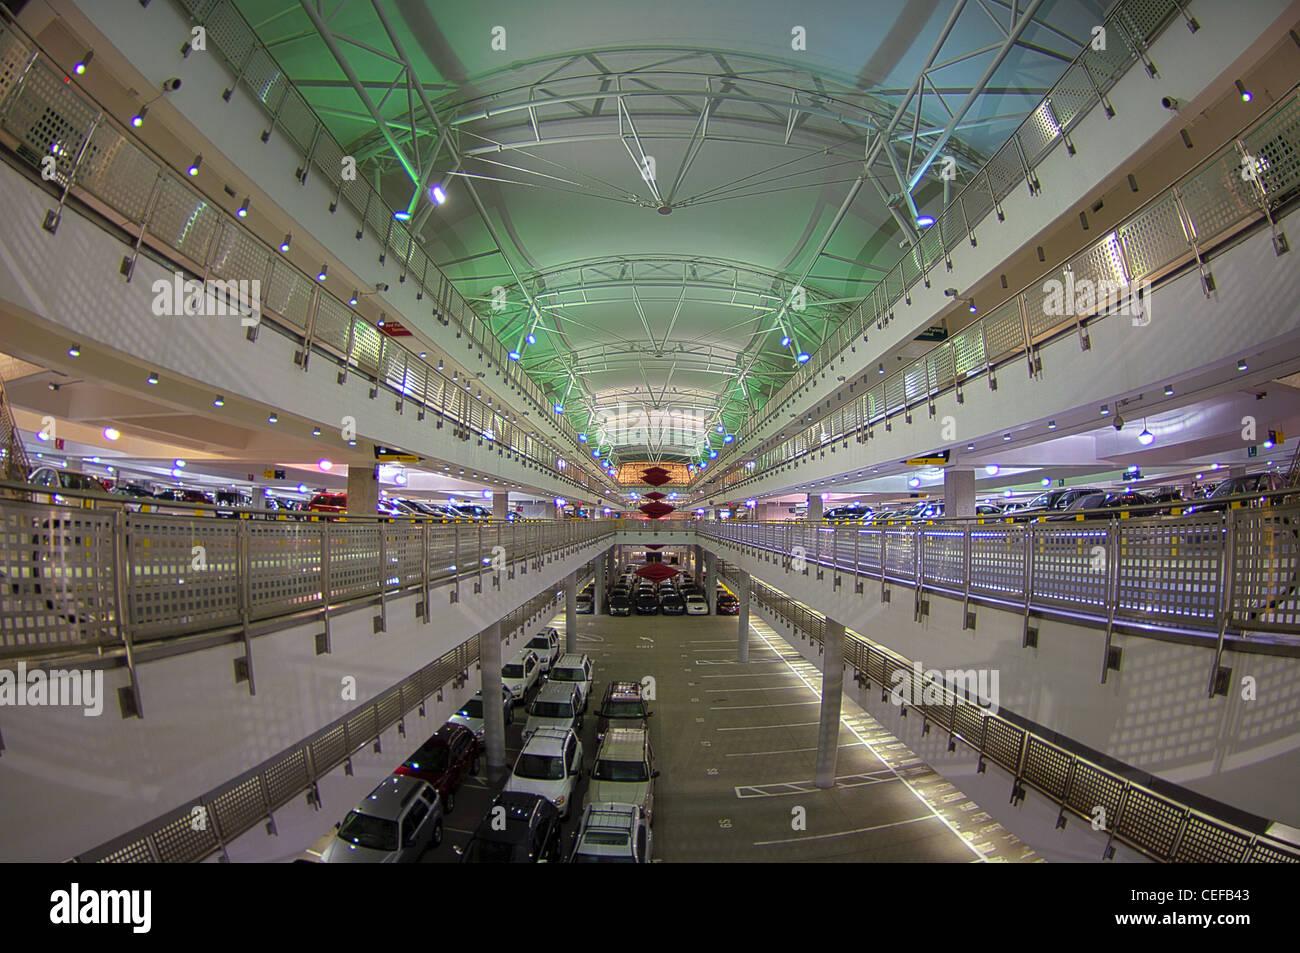 Indianapolis airport garage at night HDR image - Stock Image